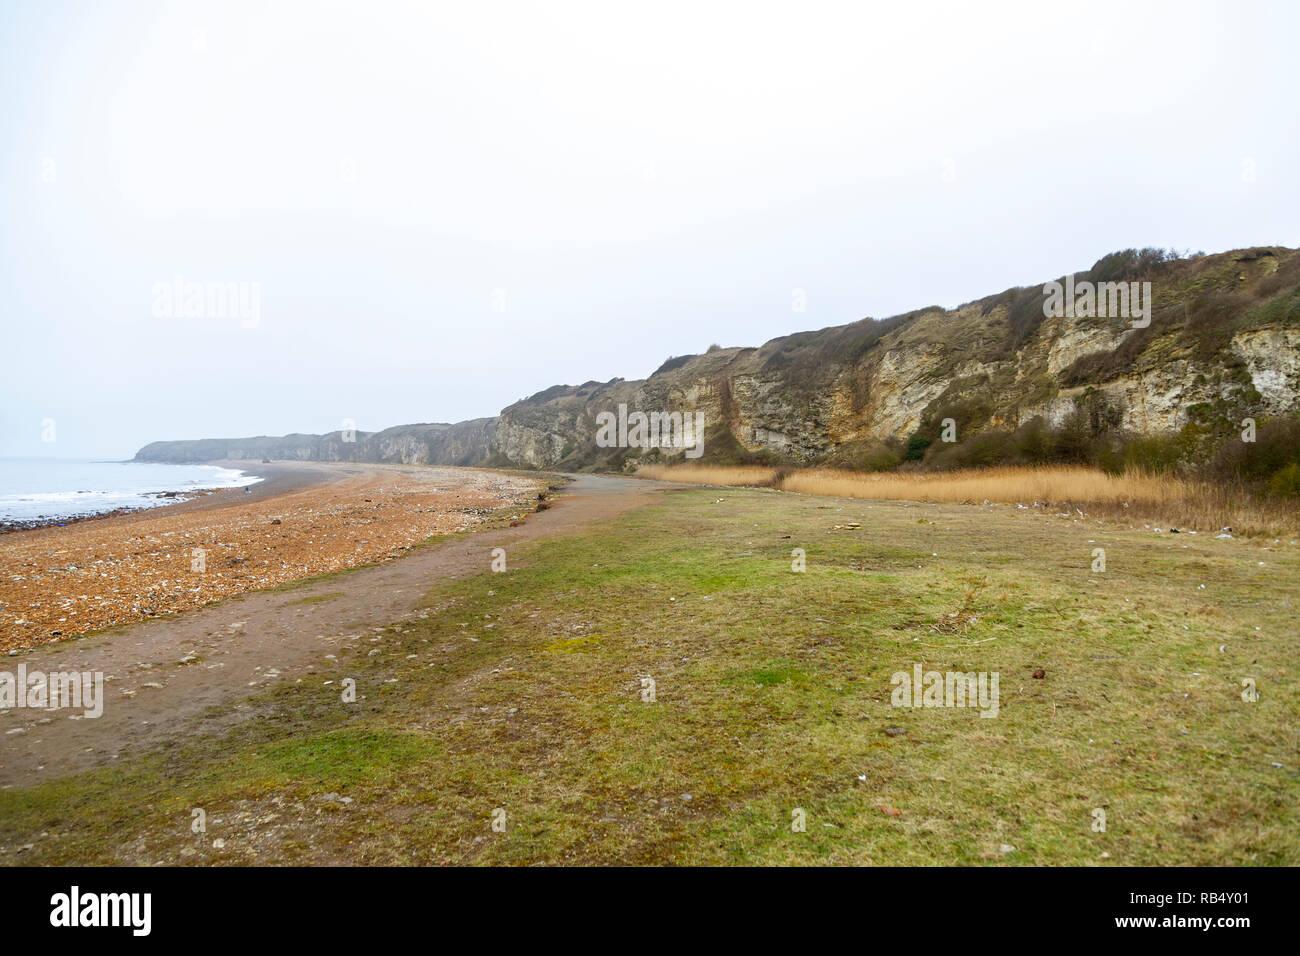 Cliffs and beach at Blast Beach, Seaham, County Durham - Stock Image